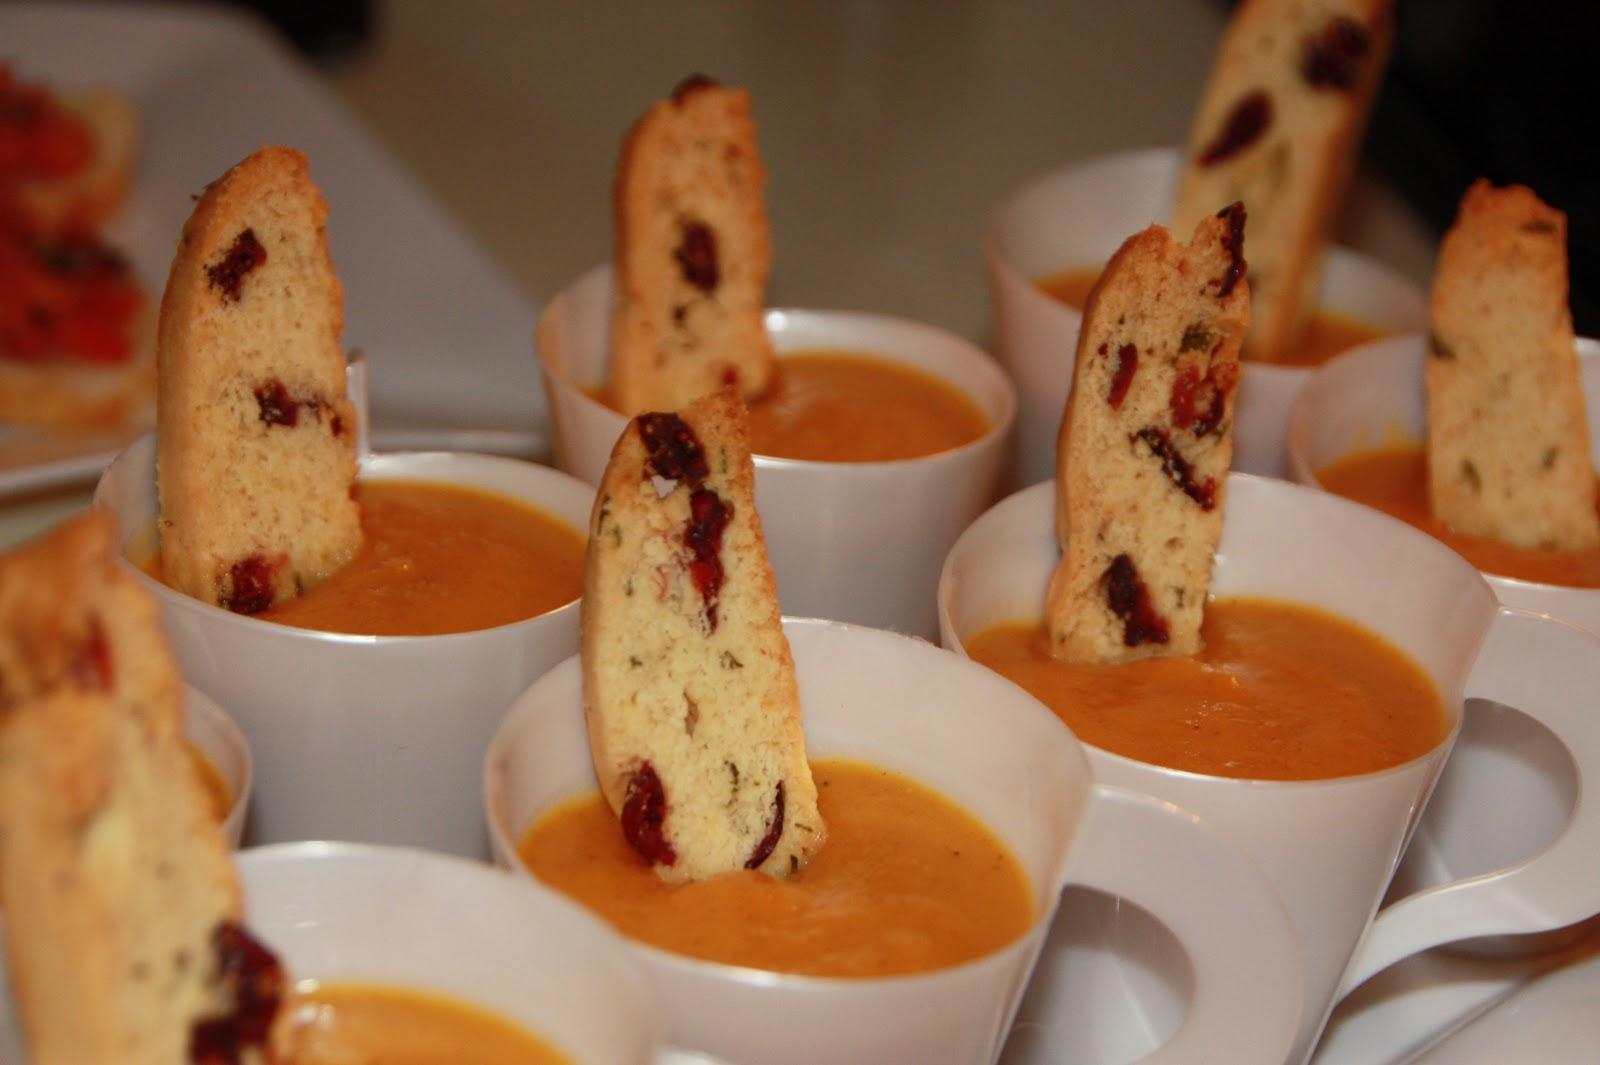 Butternut Squash Soup Ina Garten Amusing Of Butternut Squash Soup Pictures